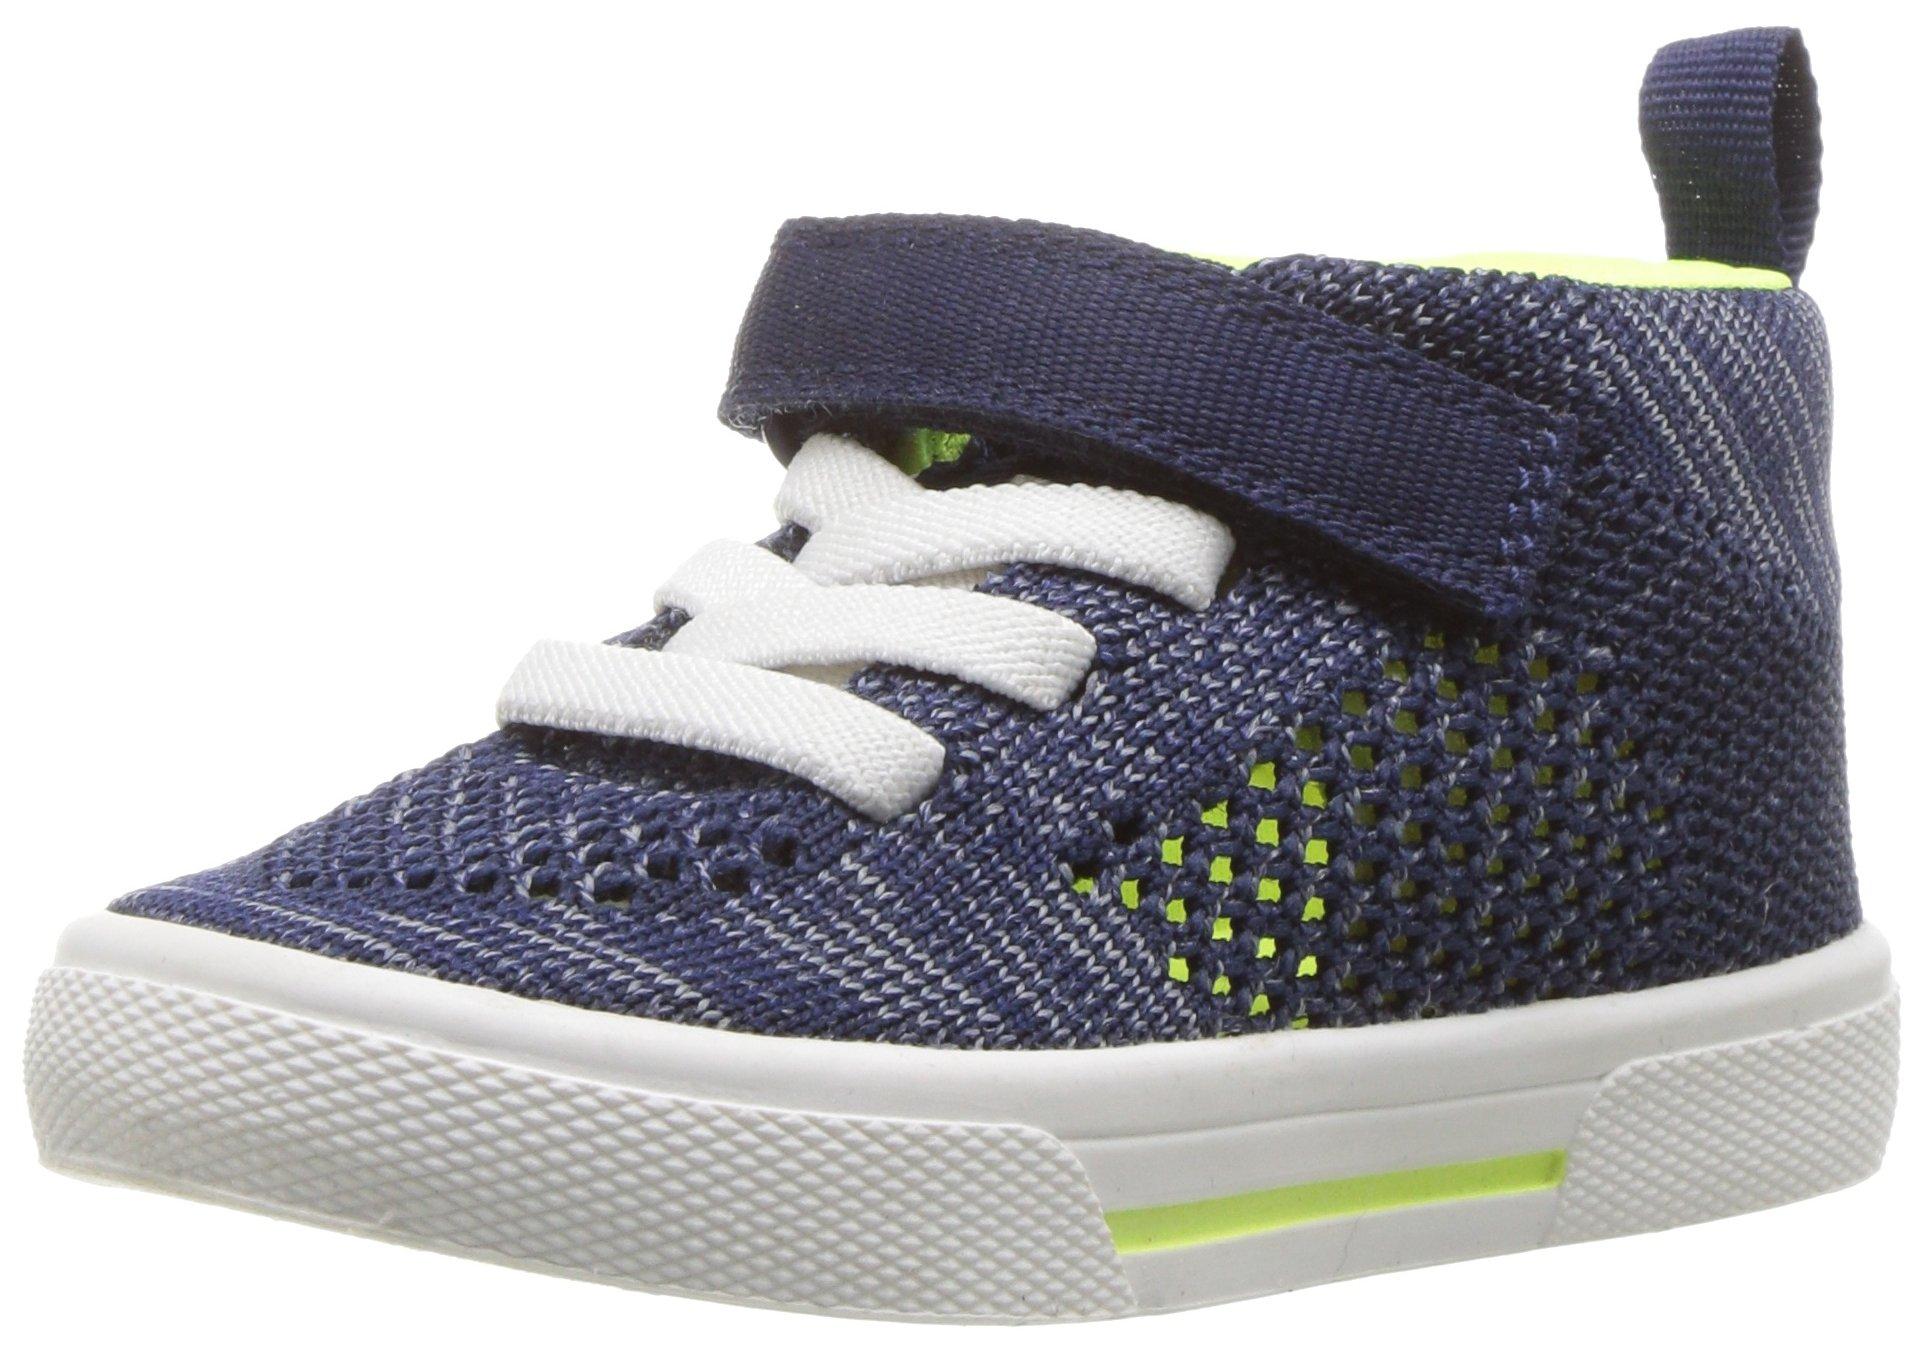 Carter's Boys' Knight High-Top Sneaker, Navy, 7 M US Toddler